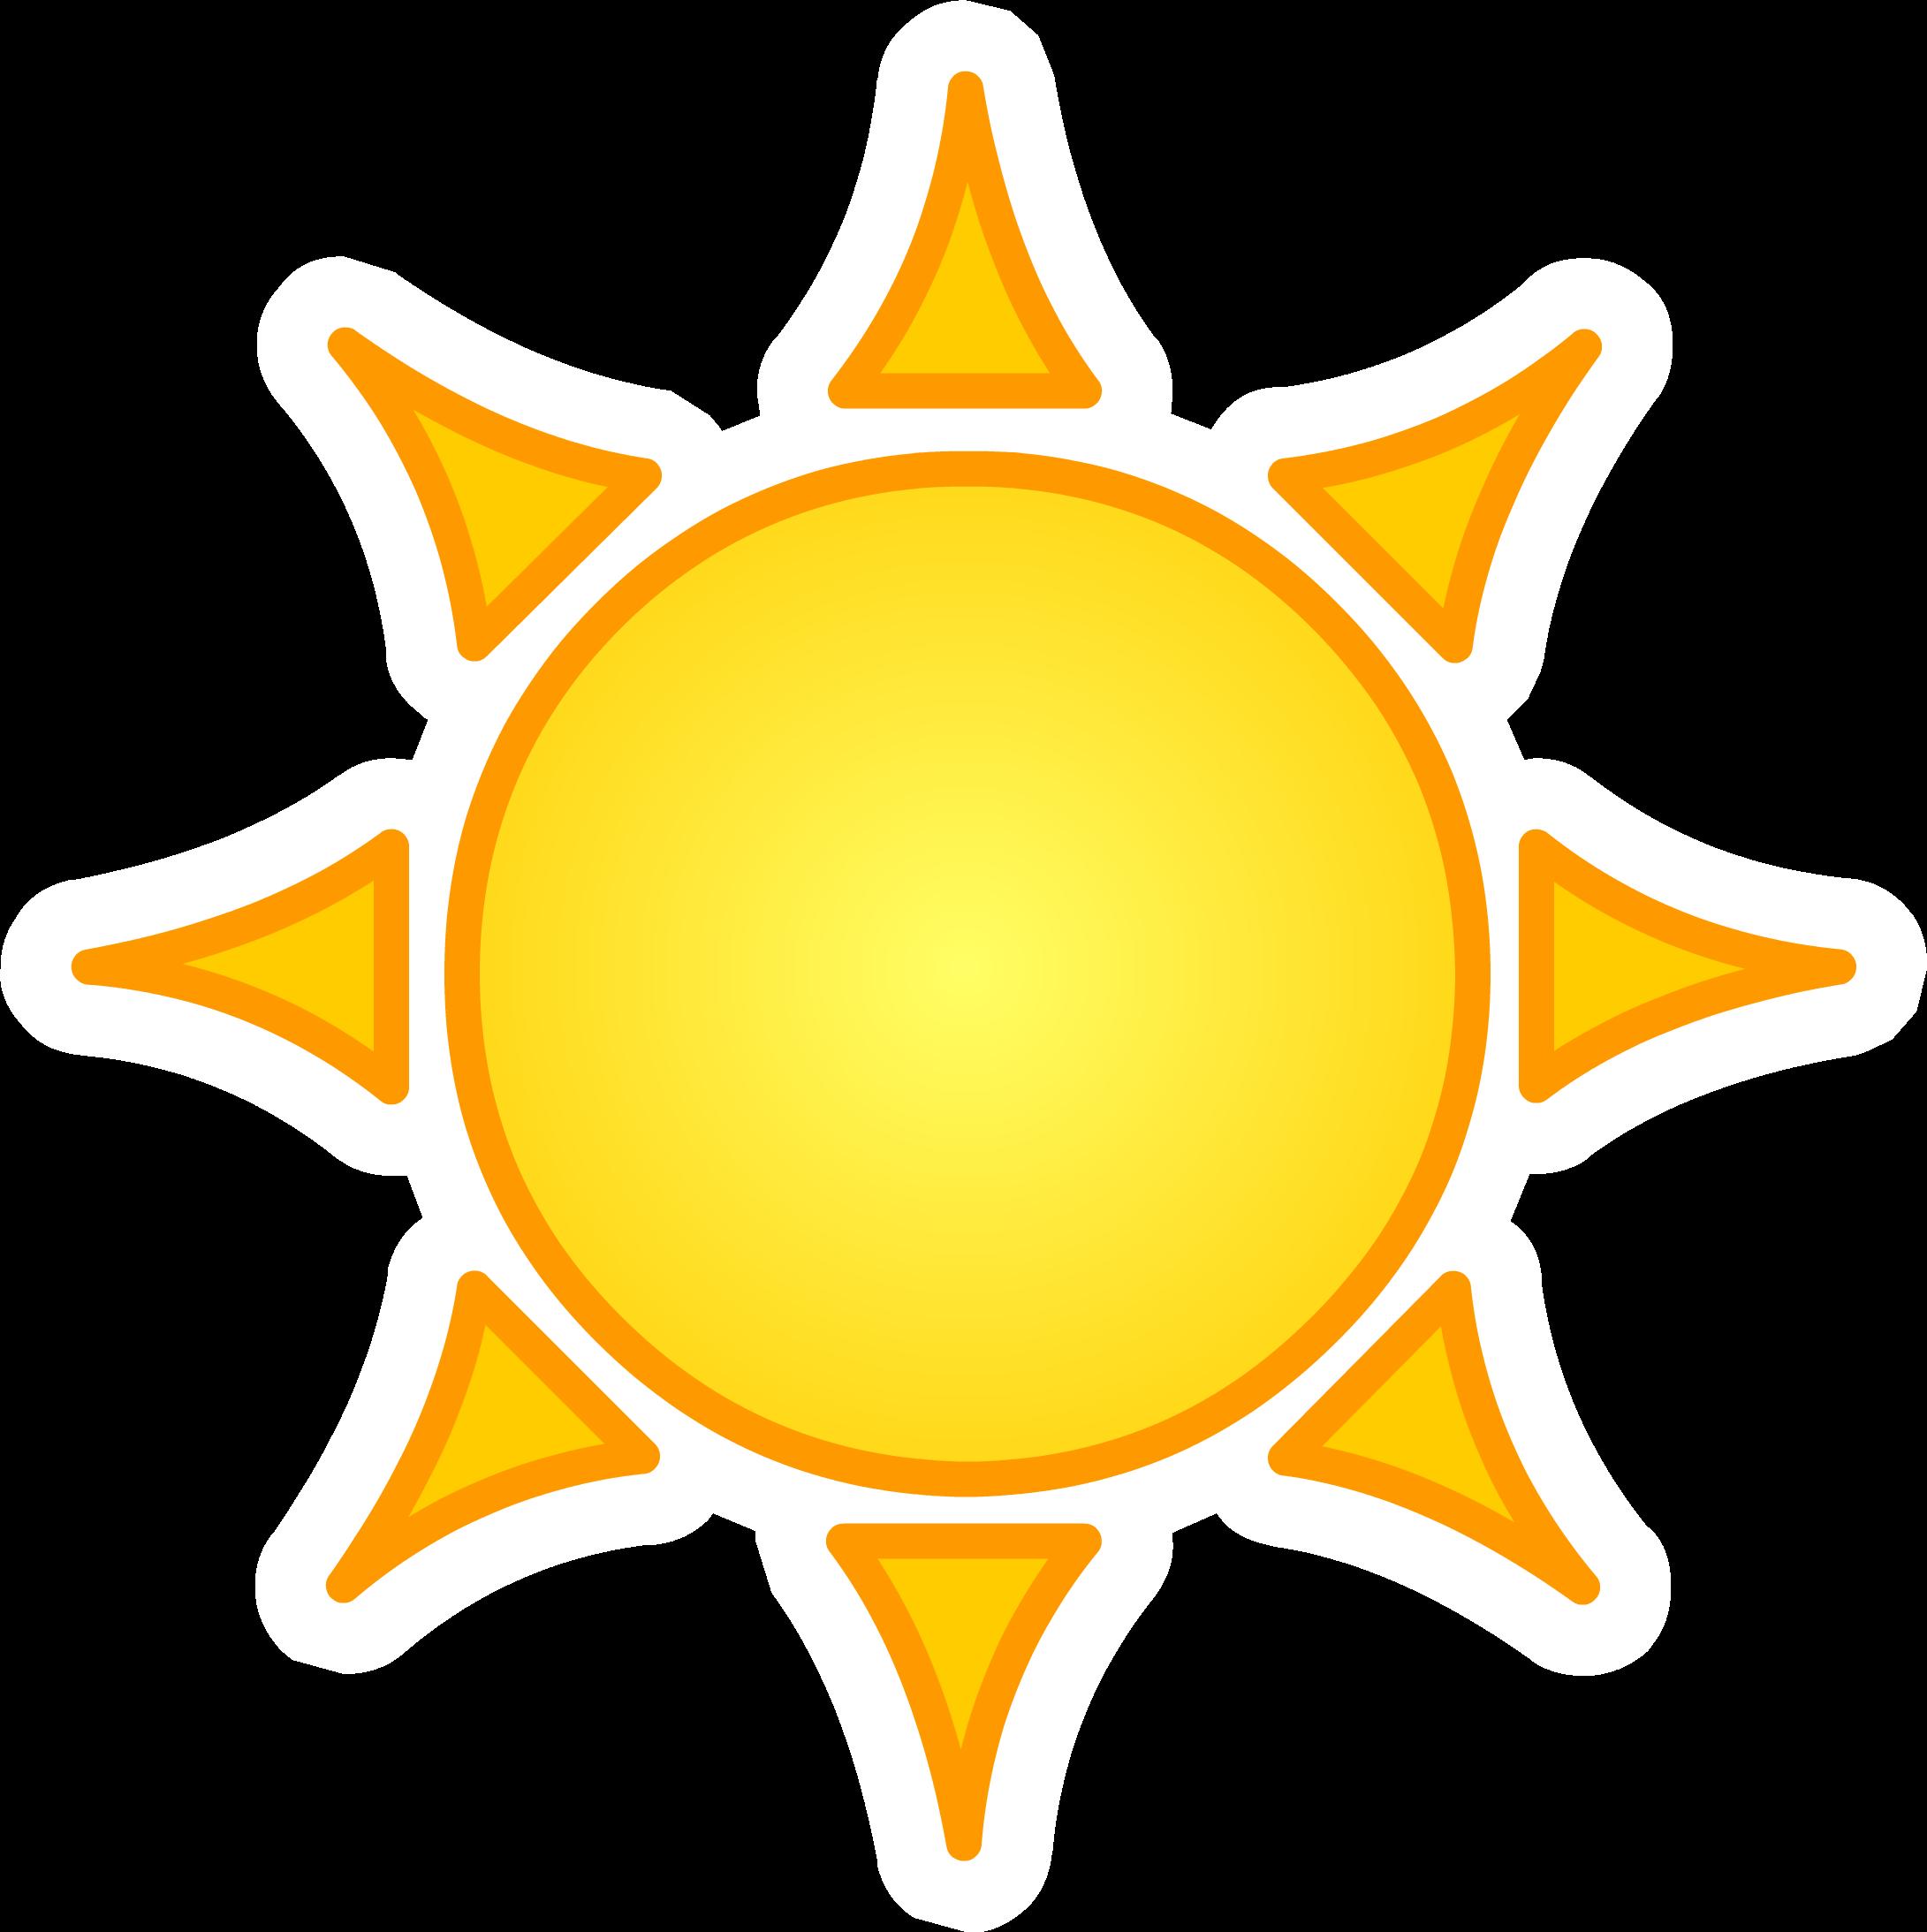 Sun Pics, Sci Fi Collection